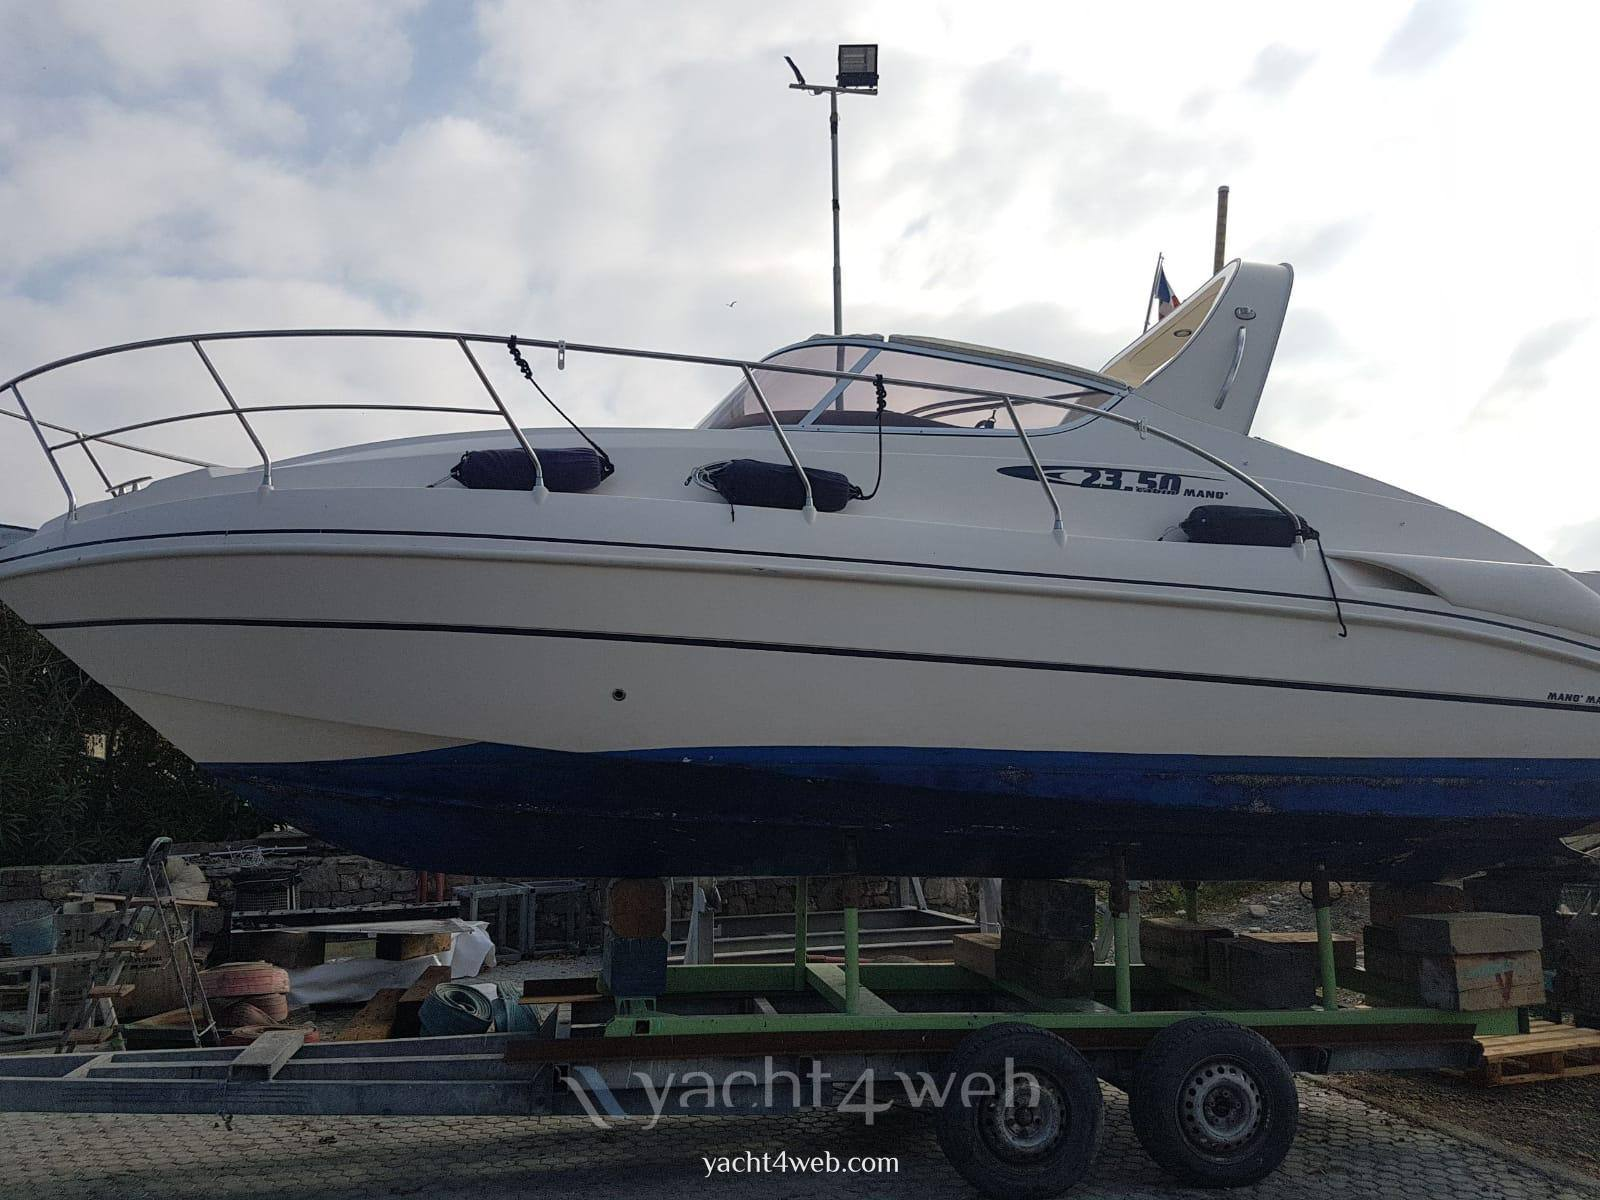 Mano' Marine Mano' 23.50 cabin Express cruiser